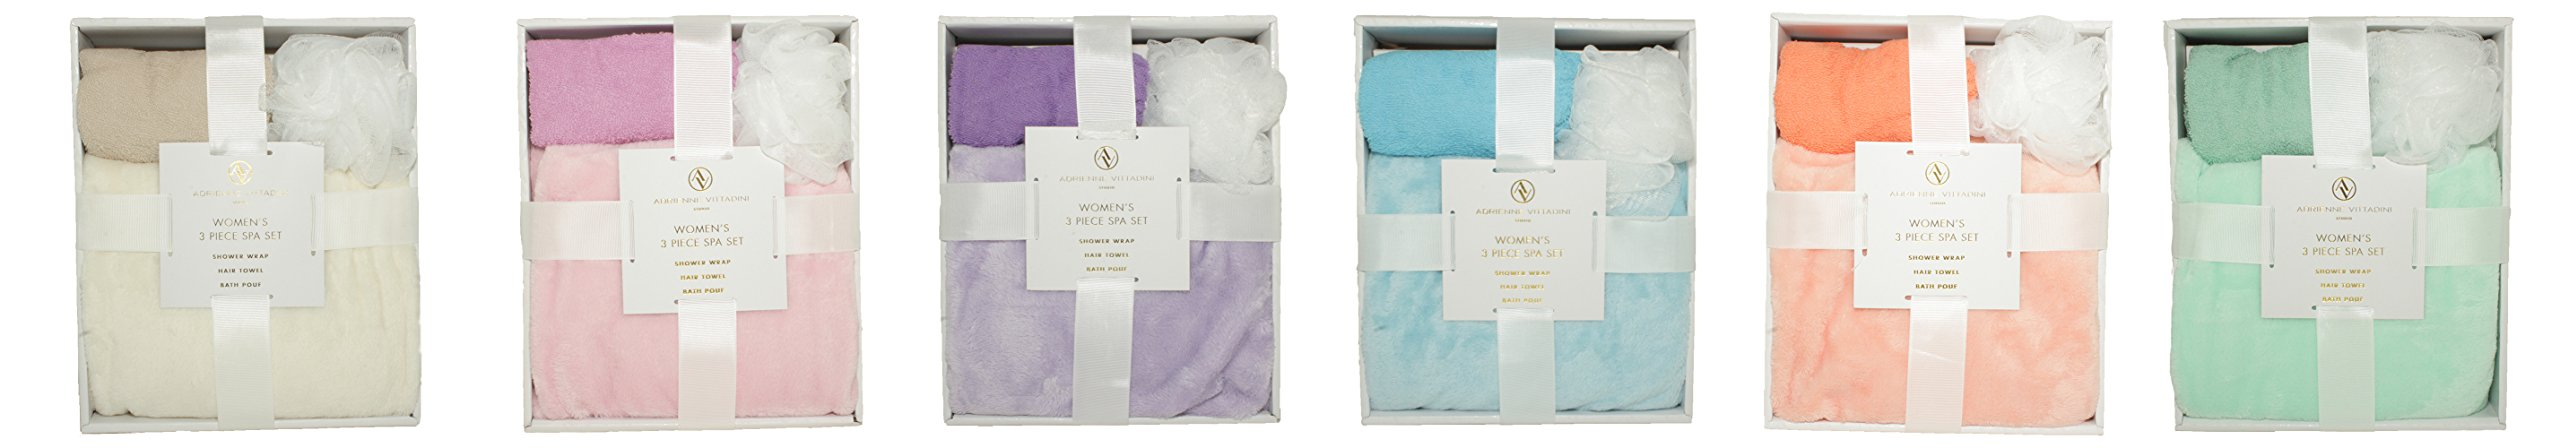 Adrienne Vittadini Women's 3 Piece Bath Body Plush Shower Towel Wrap Spa Set | Bath Body Towel Wrap with Adjustable Fastener, Hair Towel Twist, Loofah/Bath Body Sponge by Adrienne Vittadino (Image #5)